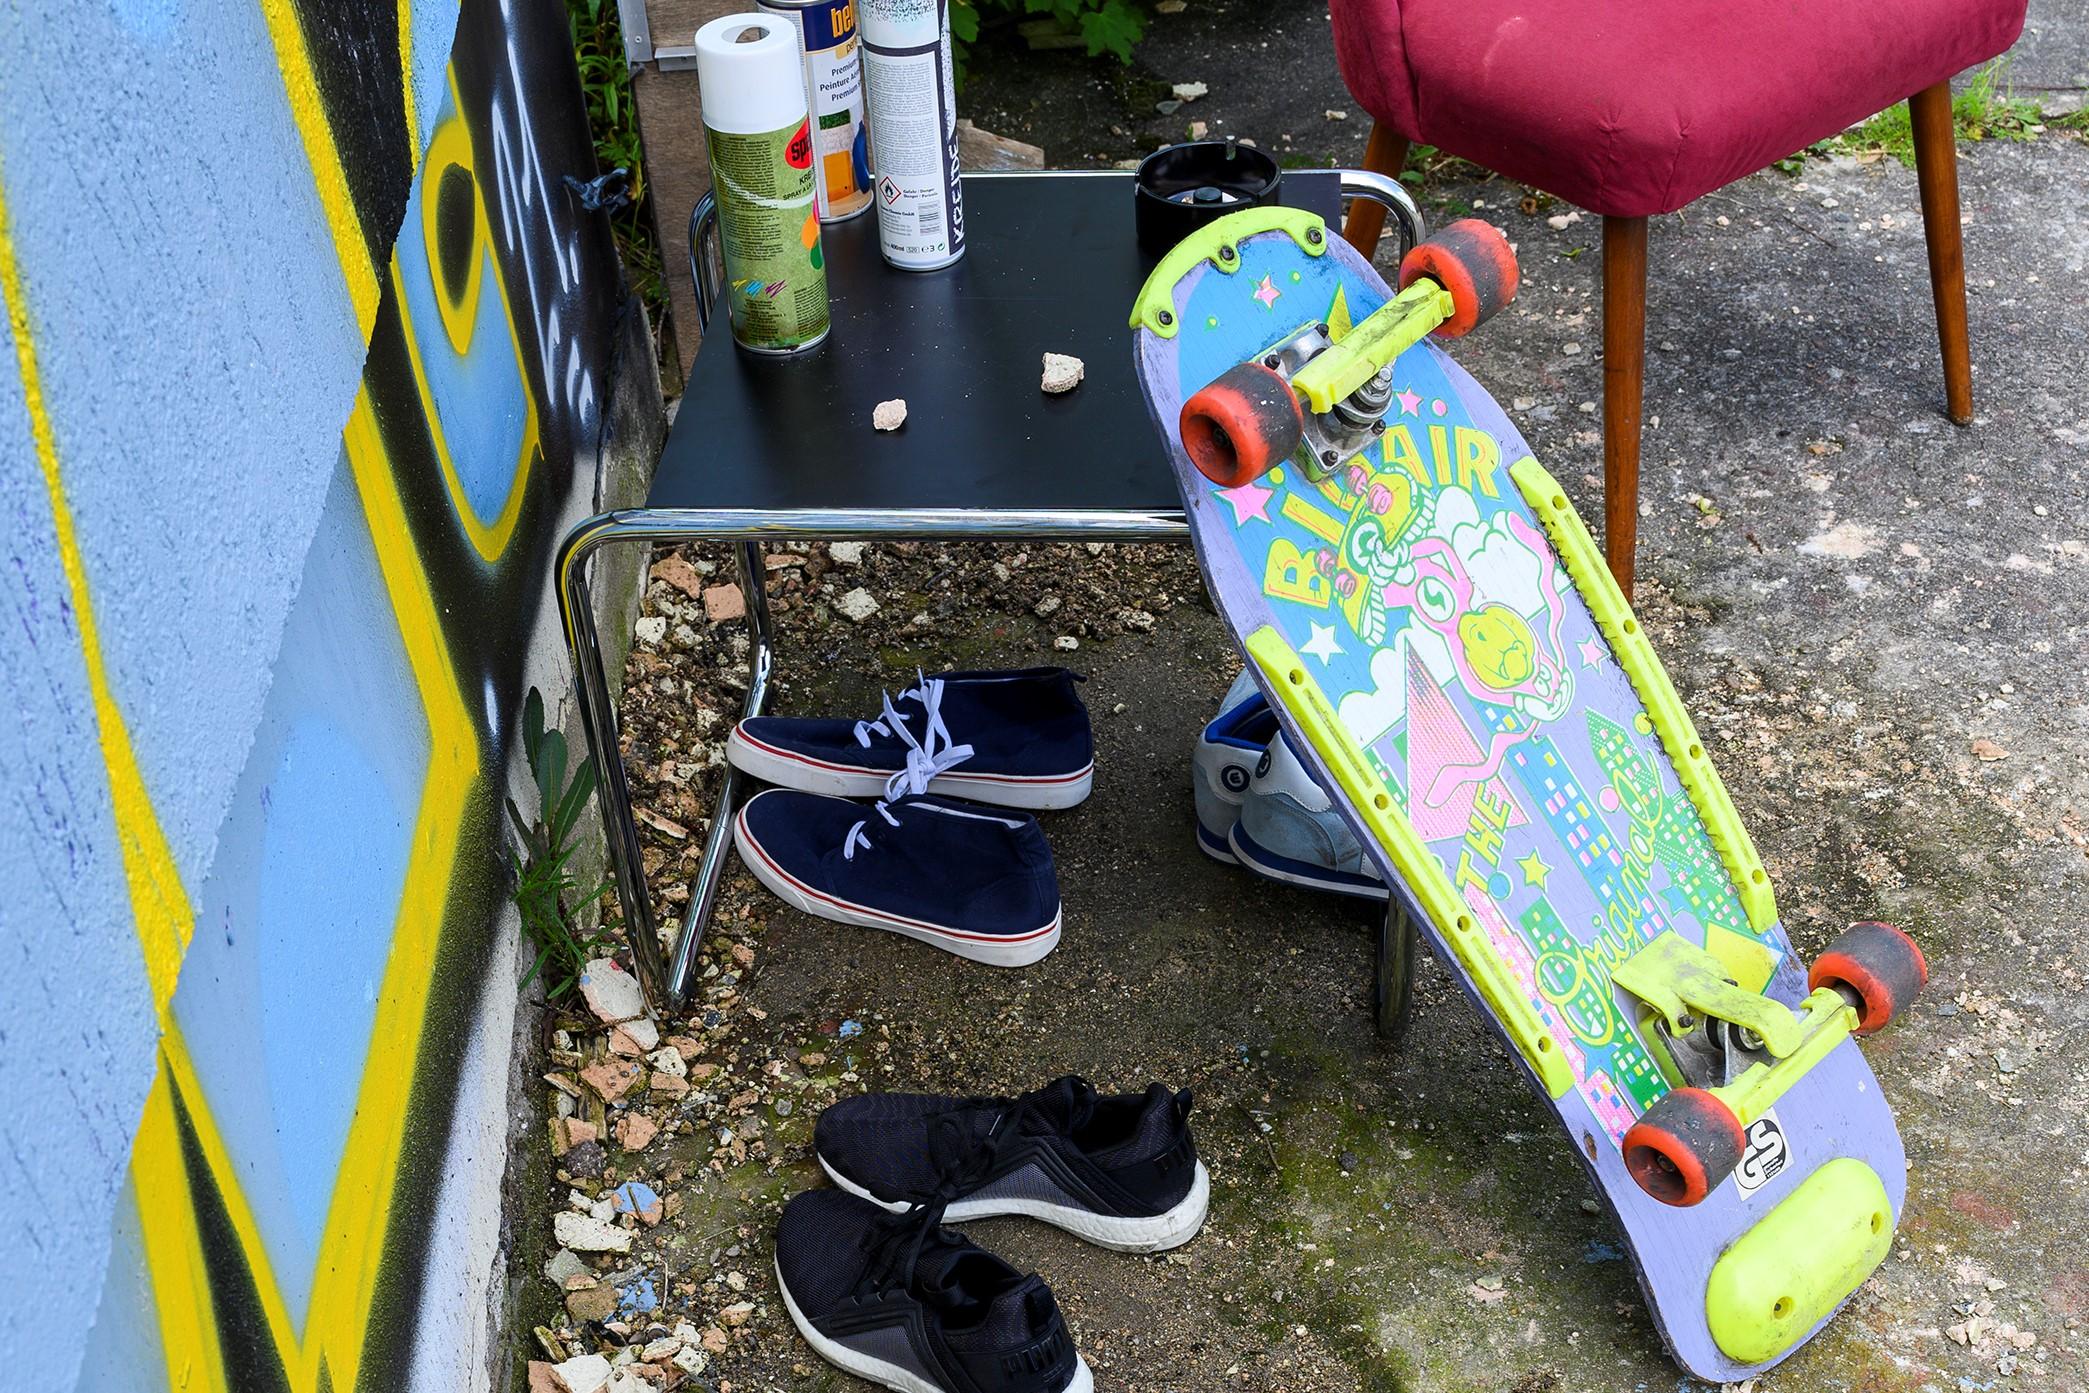 Neonfarbiges Skateboard lehnt an Beistelltisch vor besprühter Hauswand.